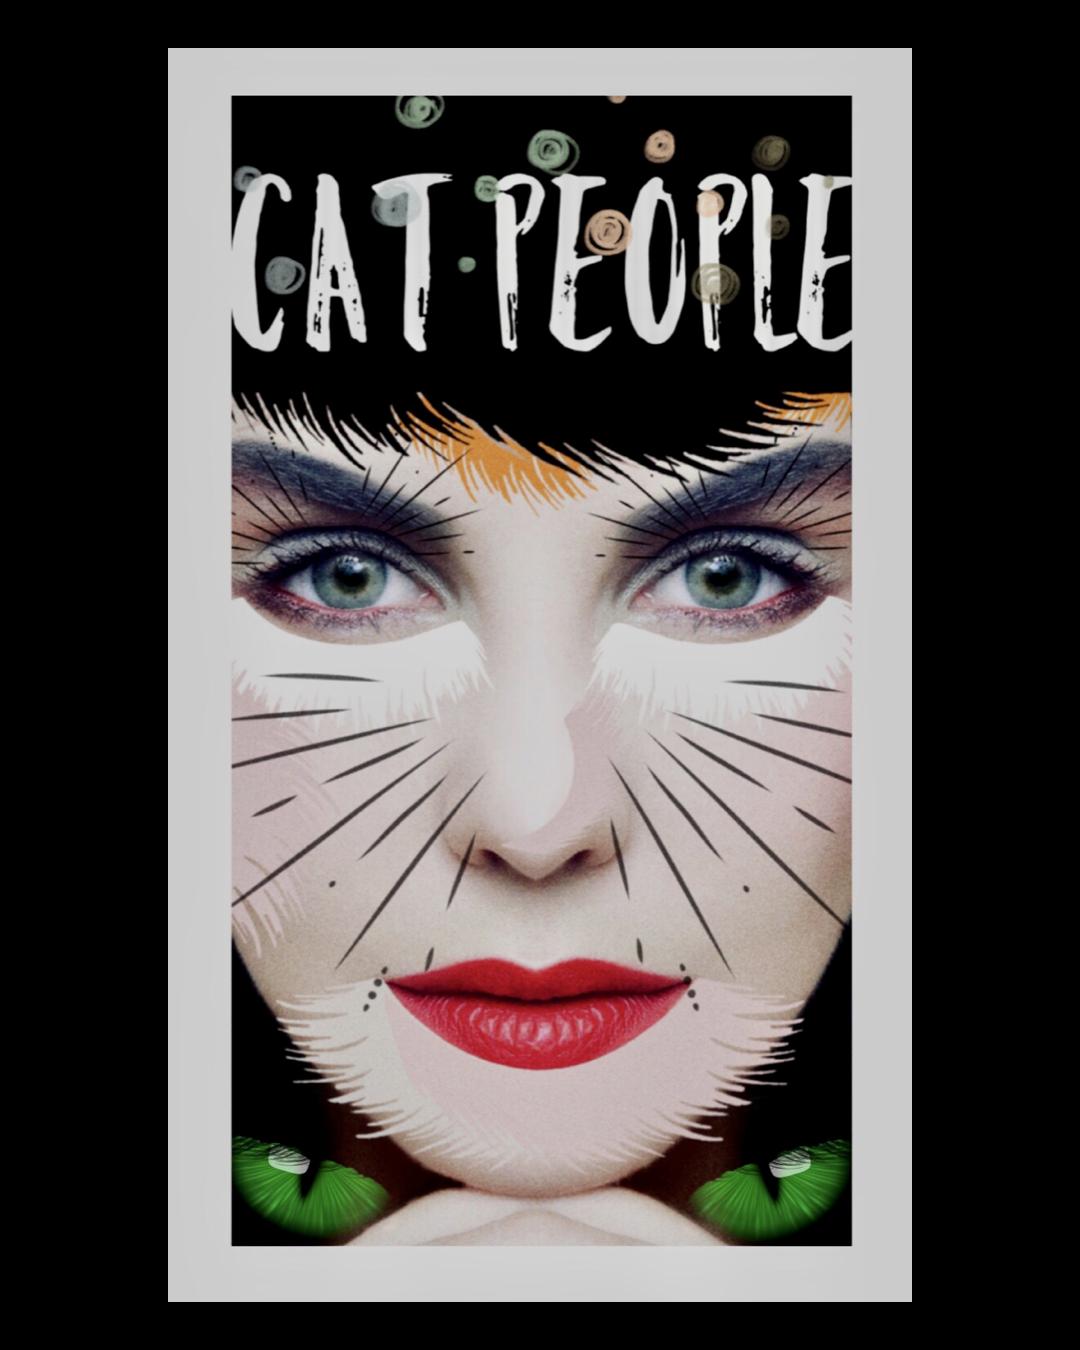 Cat People 2.0